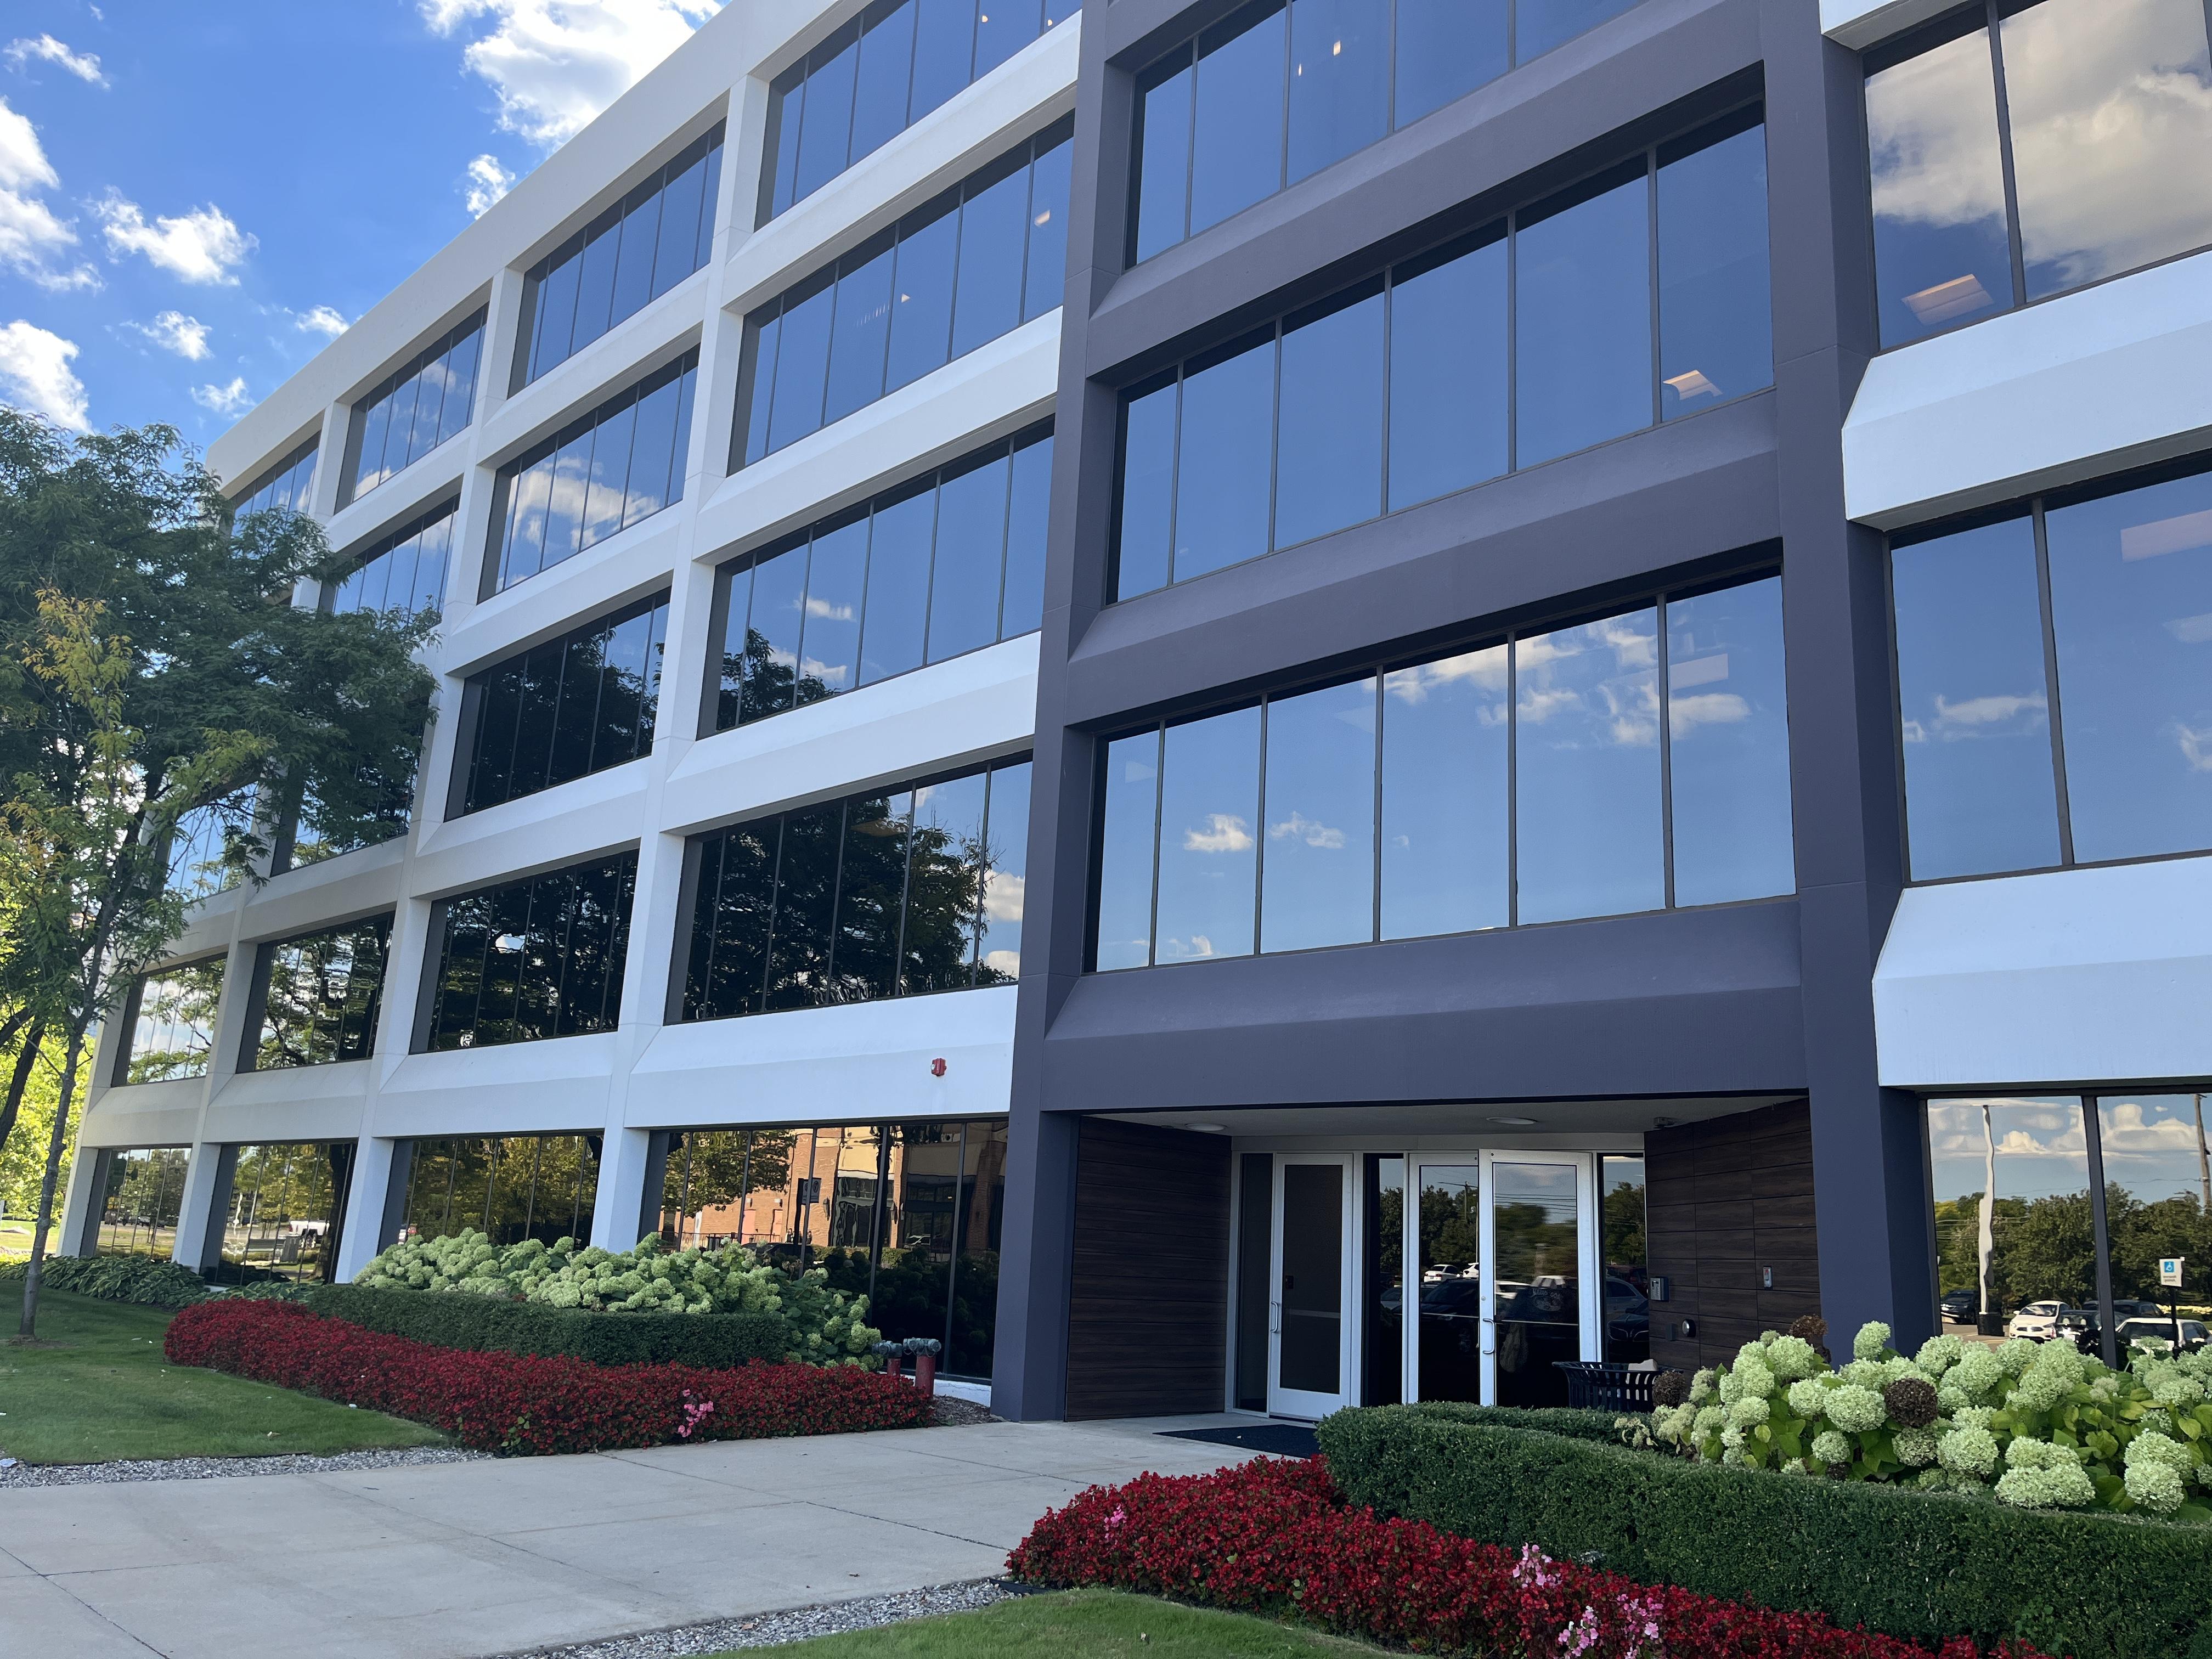 John Adams Mortgage, Corporate - Real Estate One Professionals